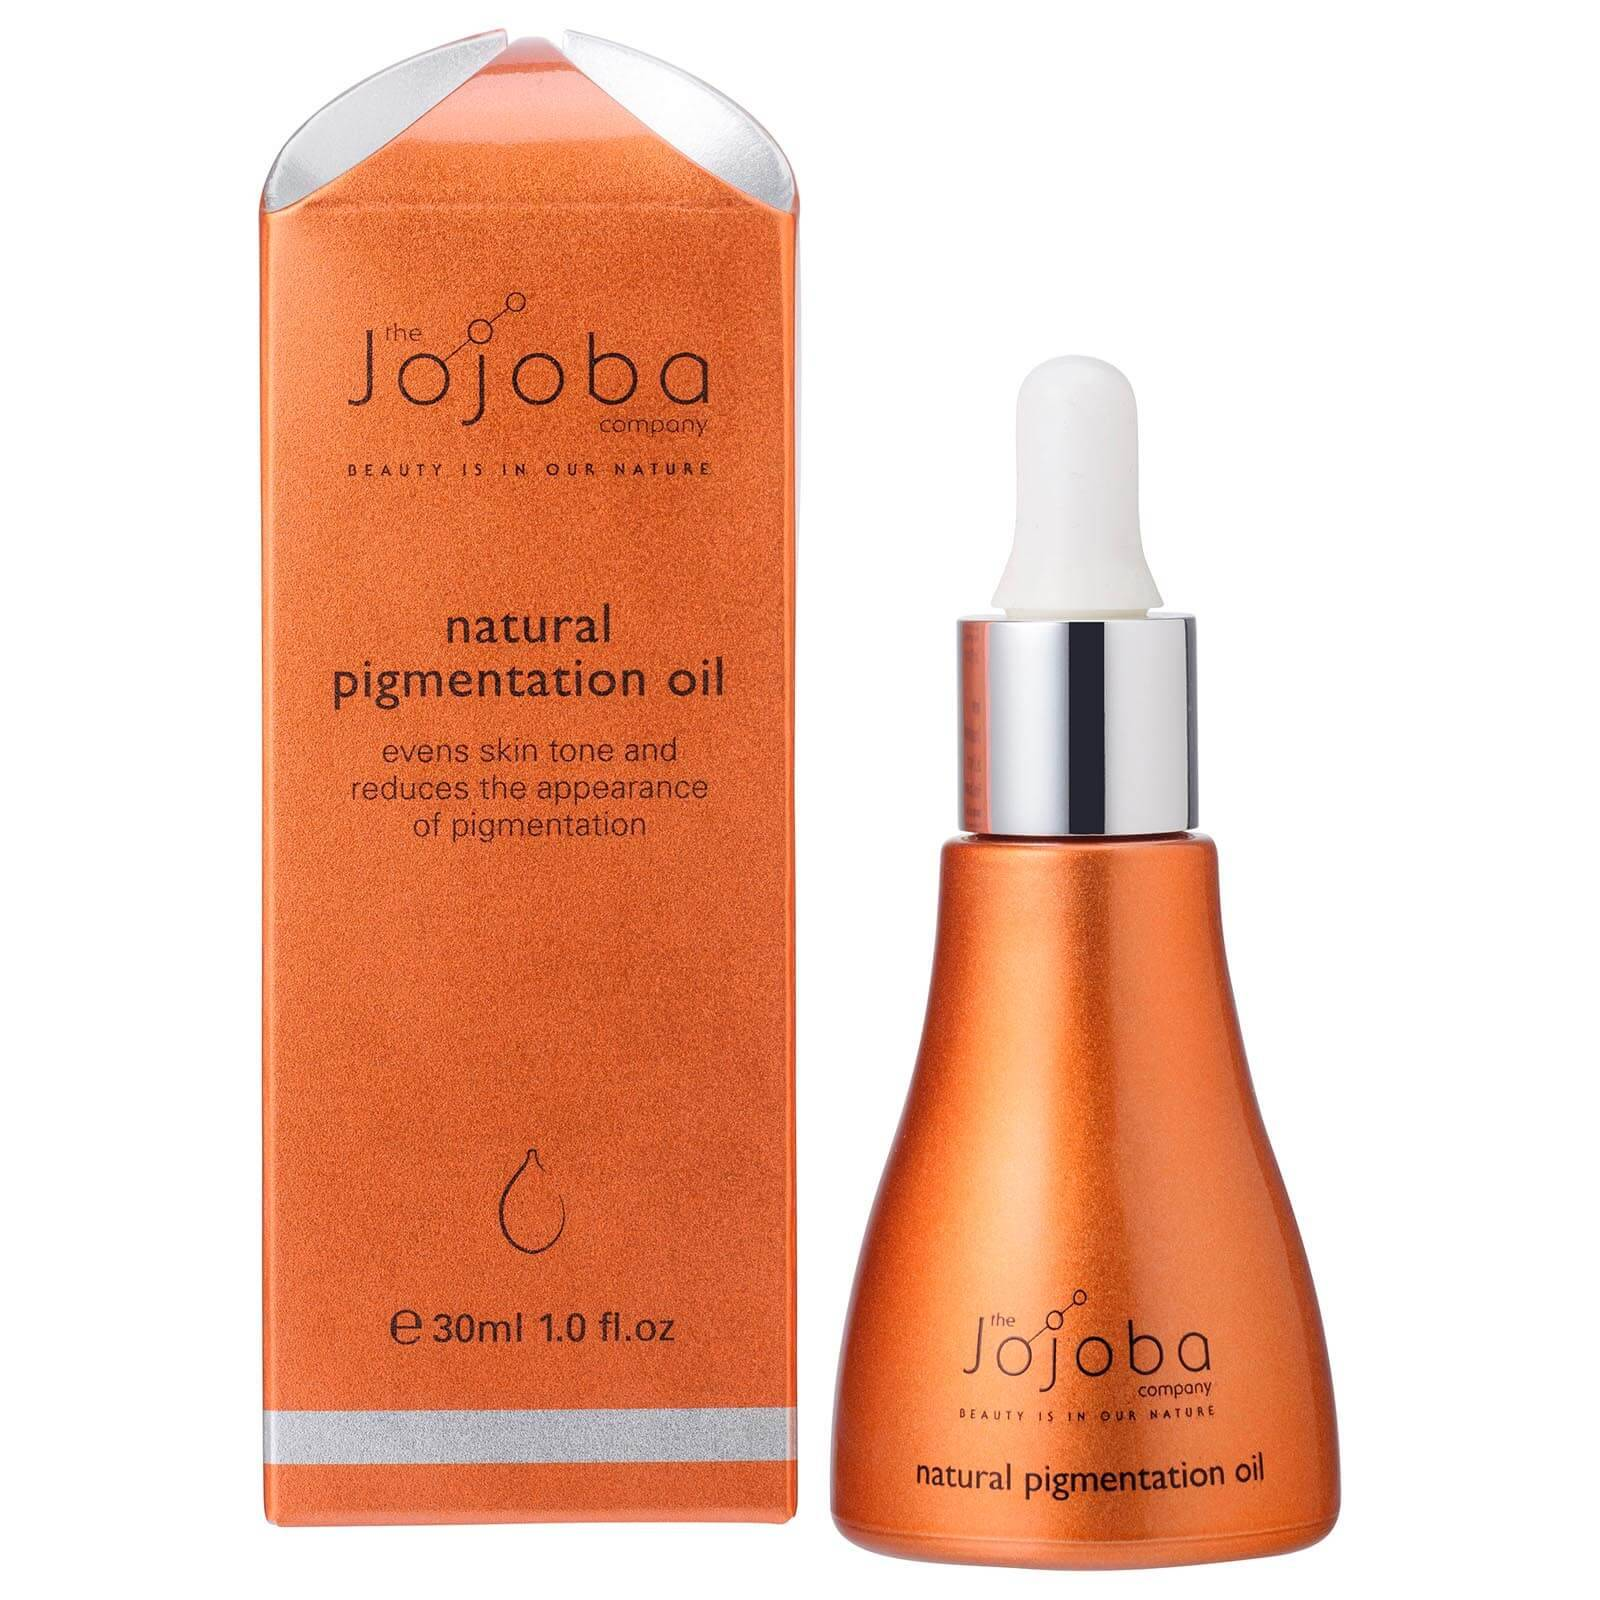 The Jojoba Company Huile anti-taches naturelle Natural Pigmentation Oil The Jojoba Company 30ml